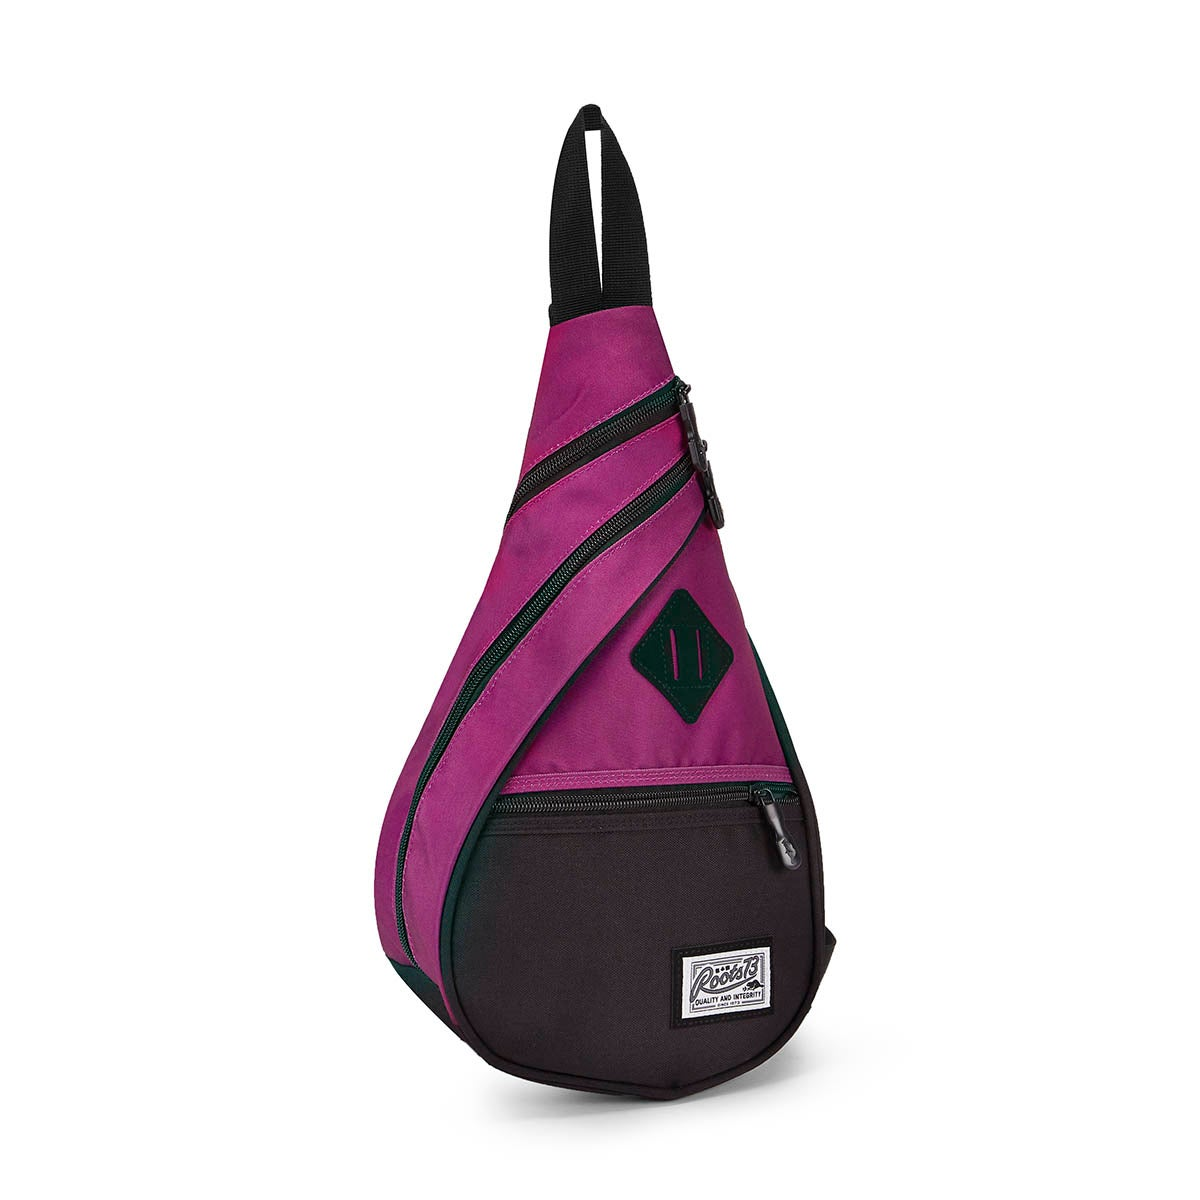 Unisex Roots73 purplepolyester sling bag